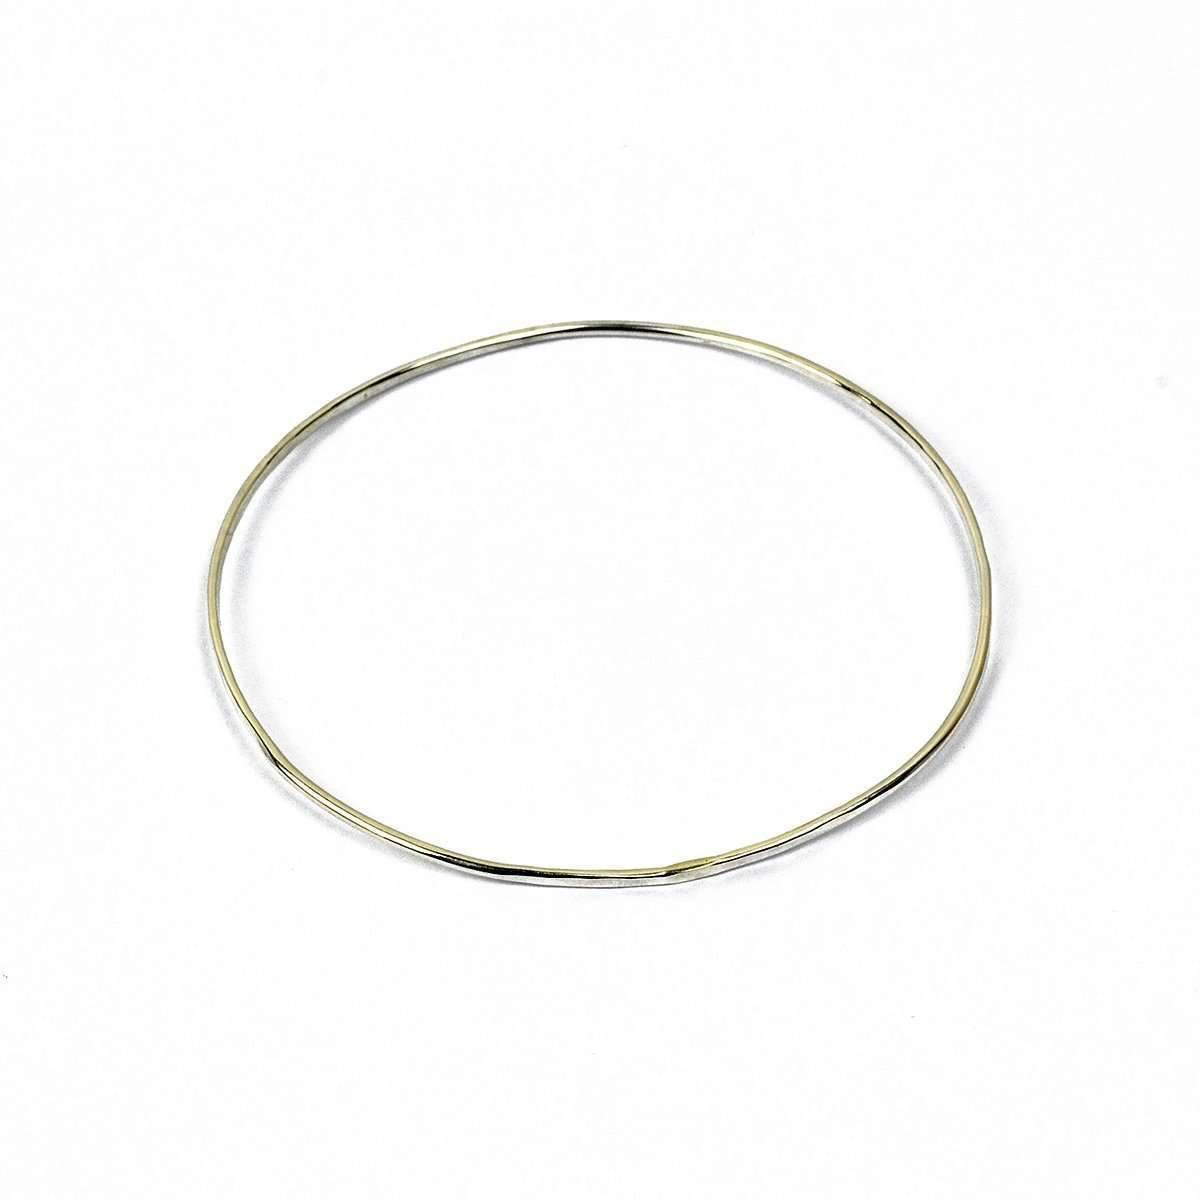 Fran Regan Jewellery Silver Egg Bangle 9SMMIPJT